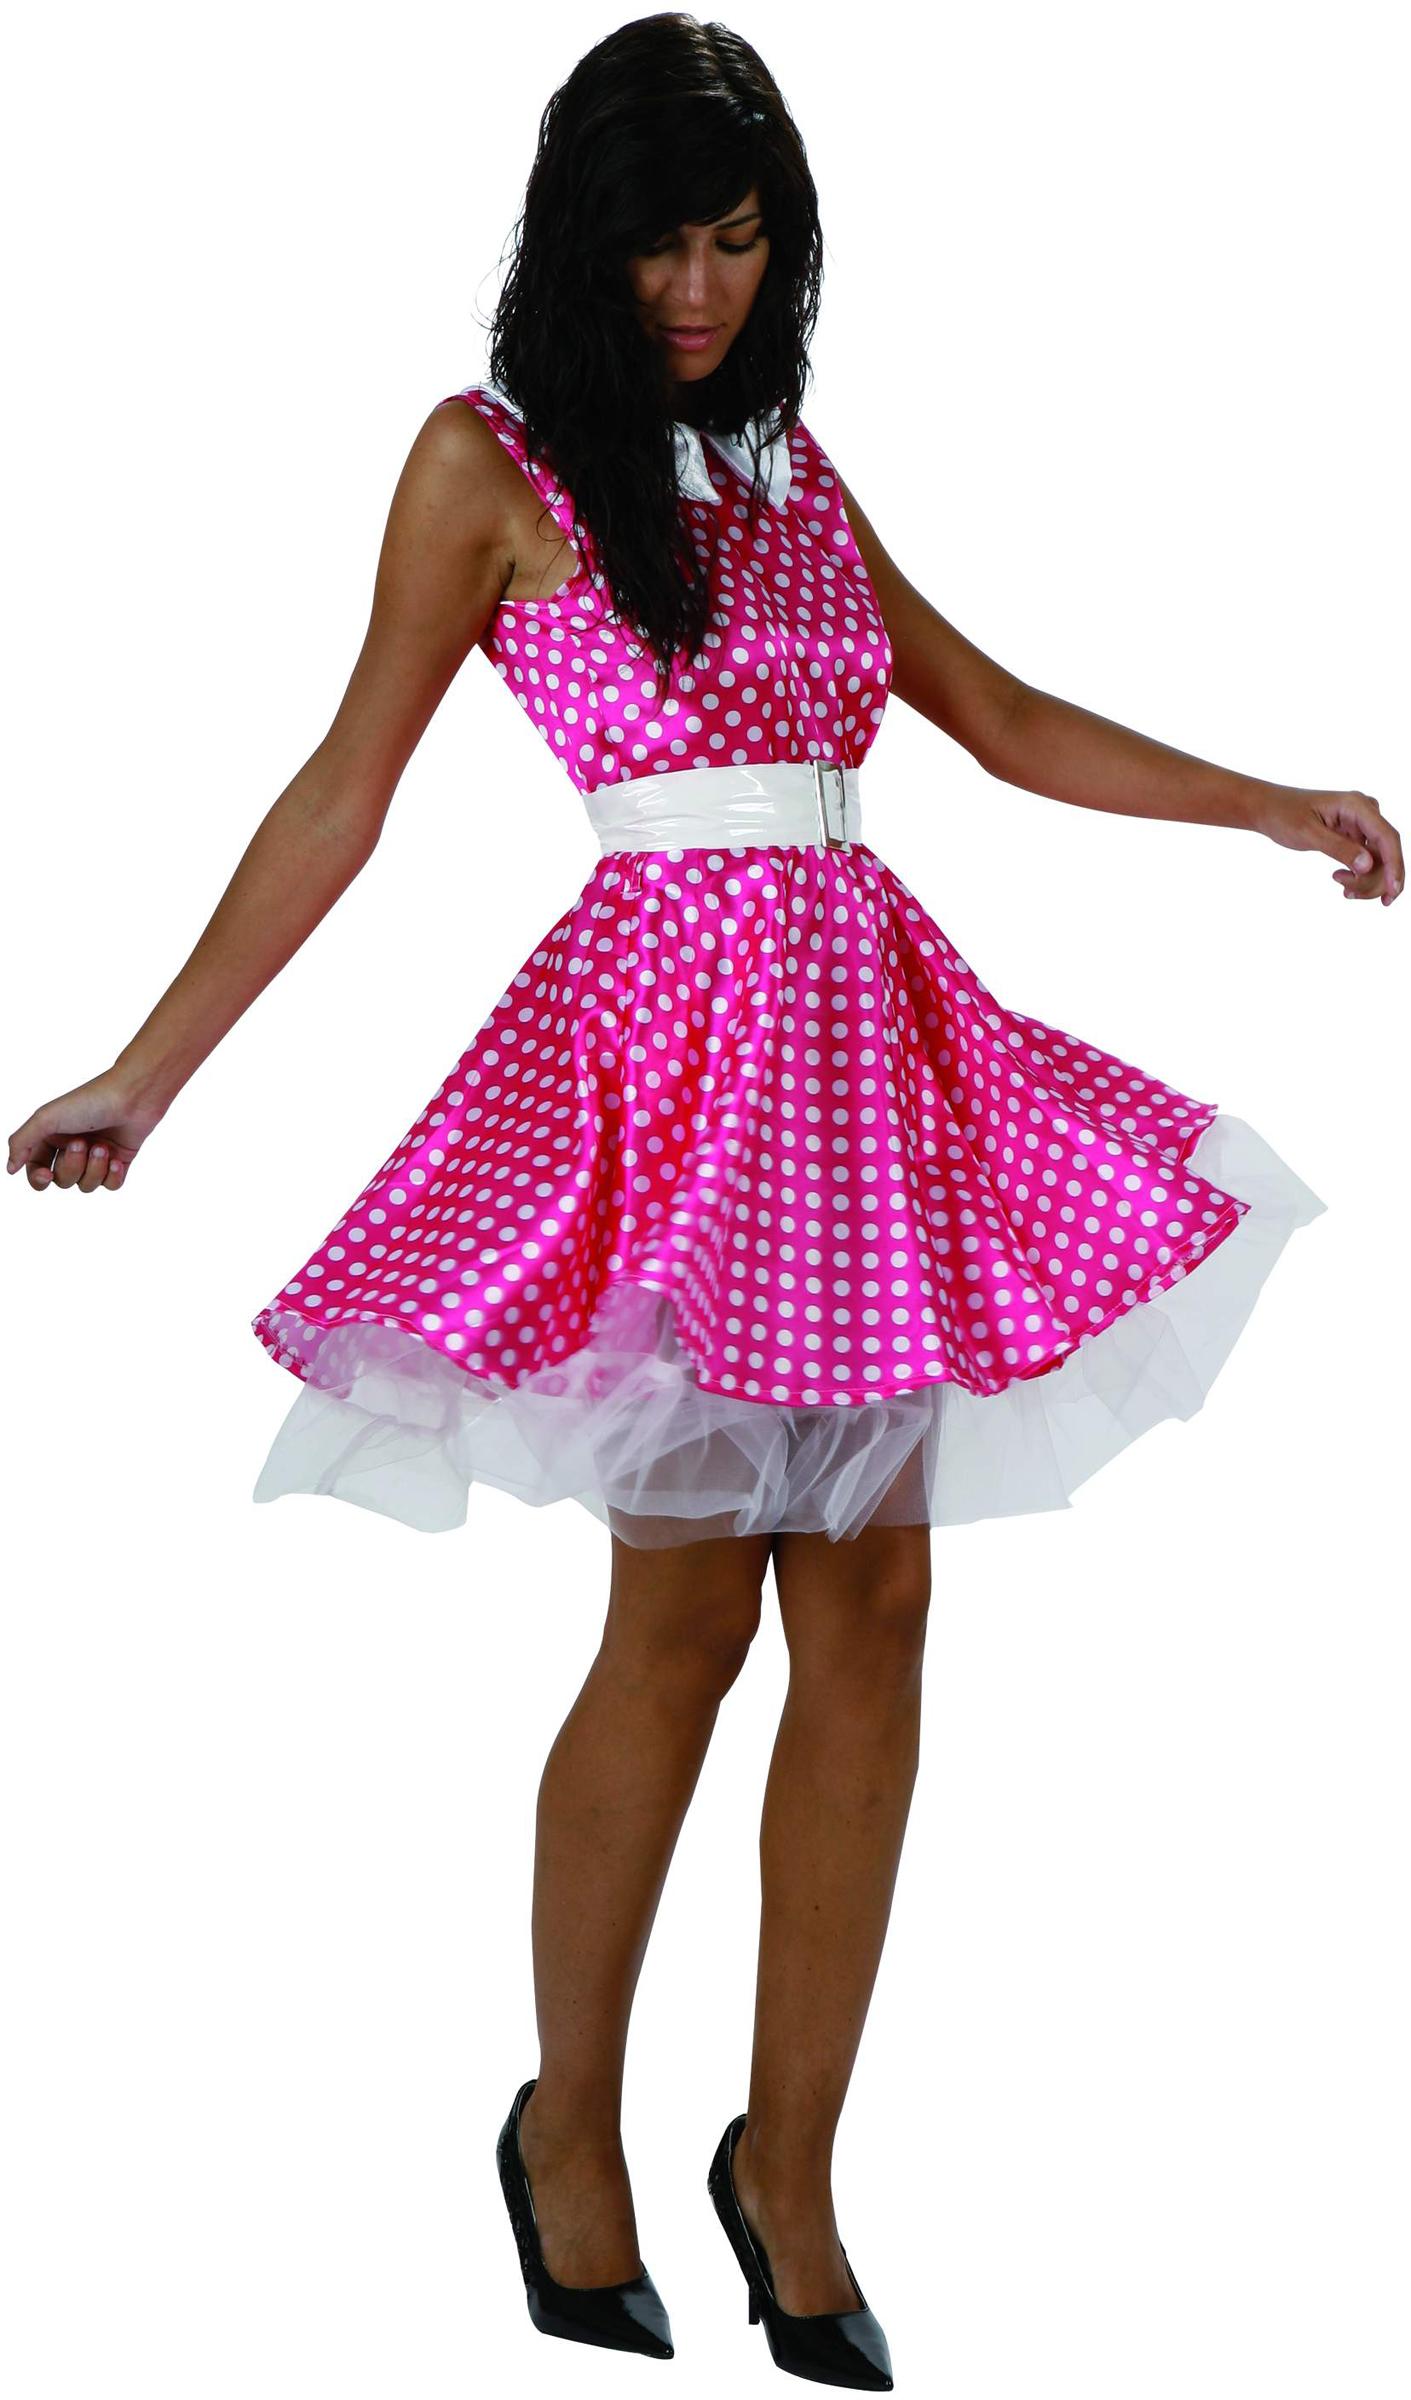 d guisement ann es 50 rose costume femme pas cher soir e fifties. Black Bedroom Furniture Sets. Home Design Ideas